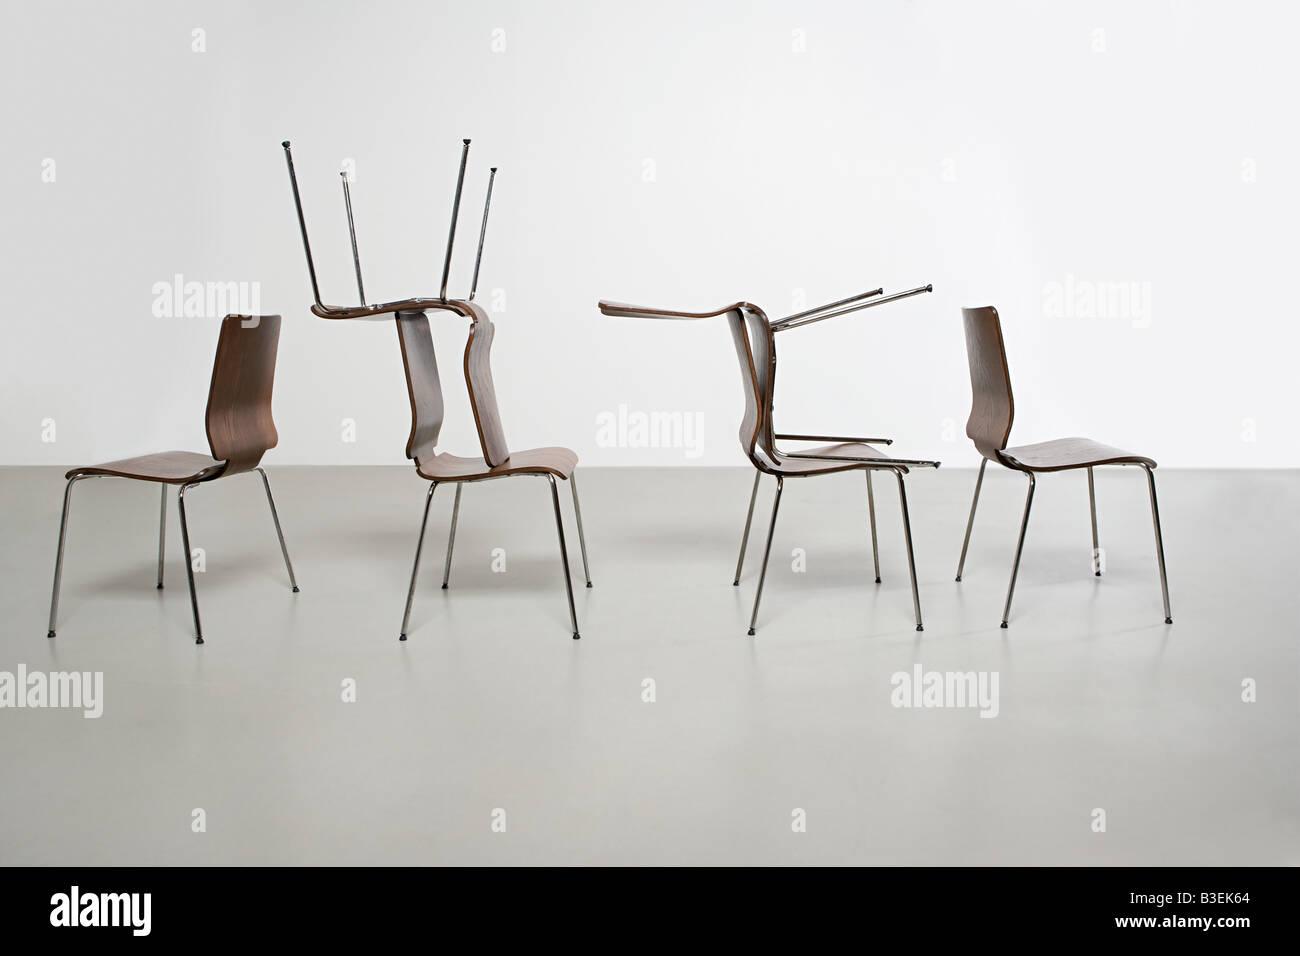 Chairs in arrangement - Stock Image